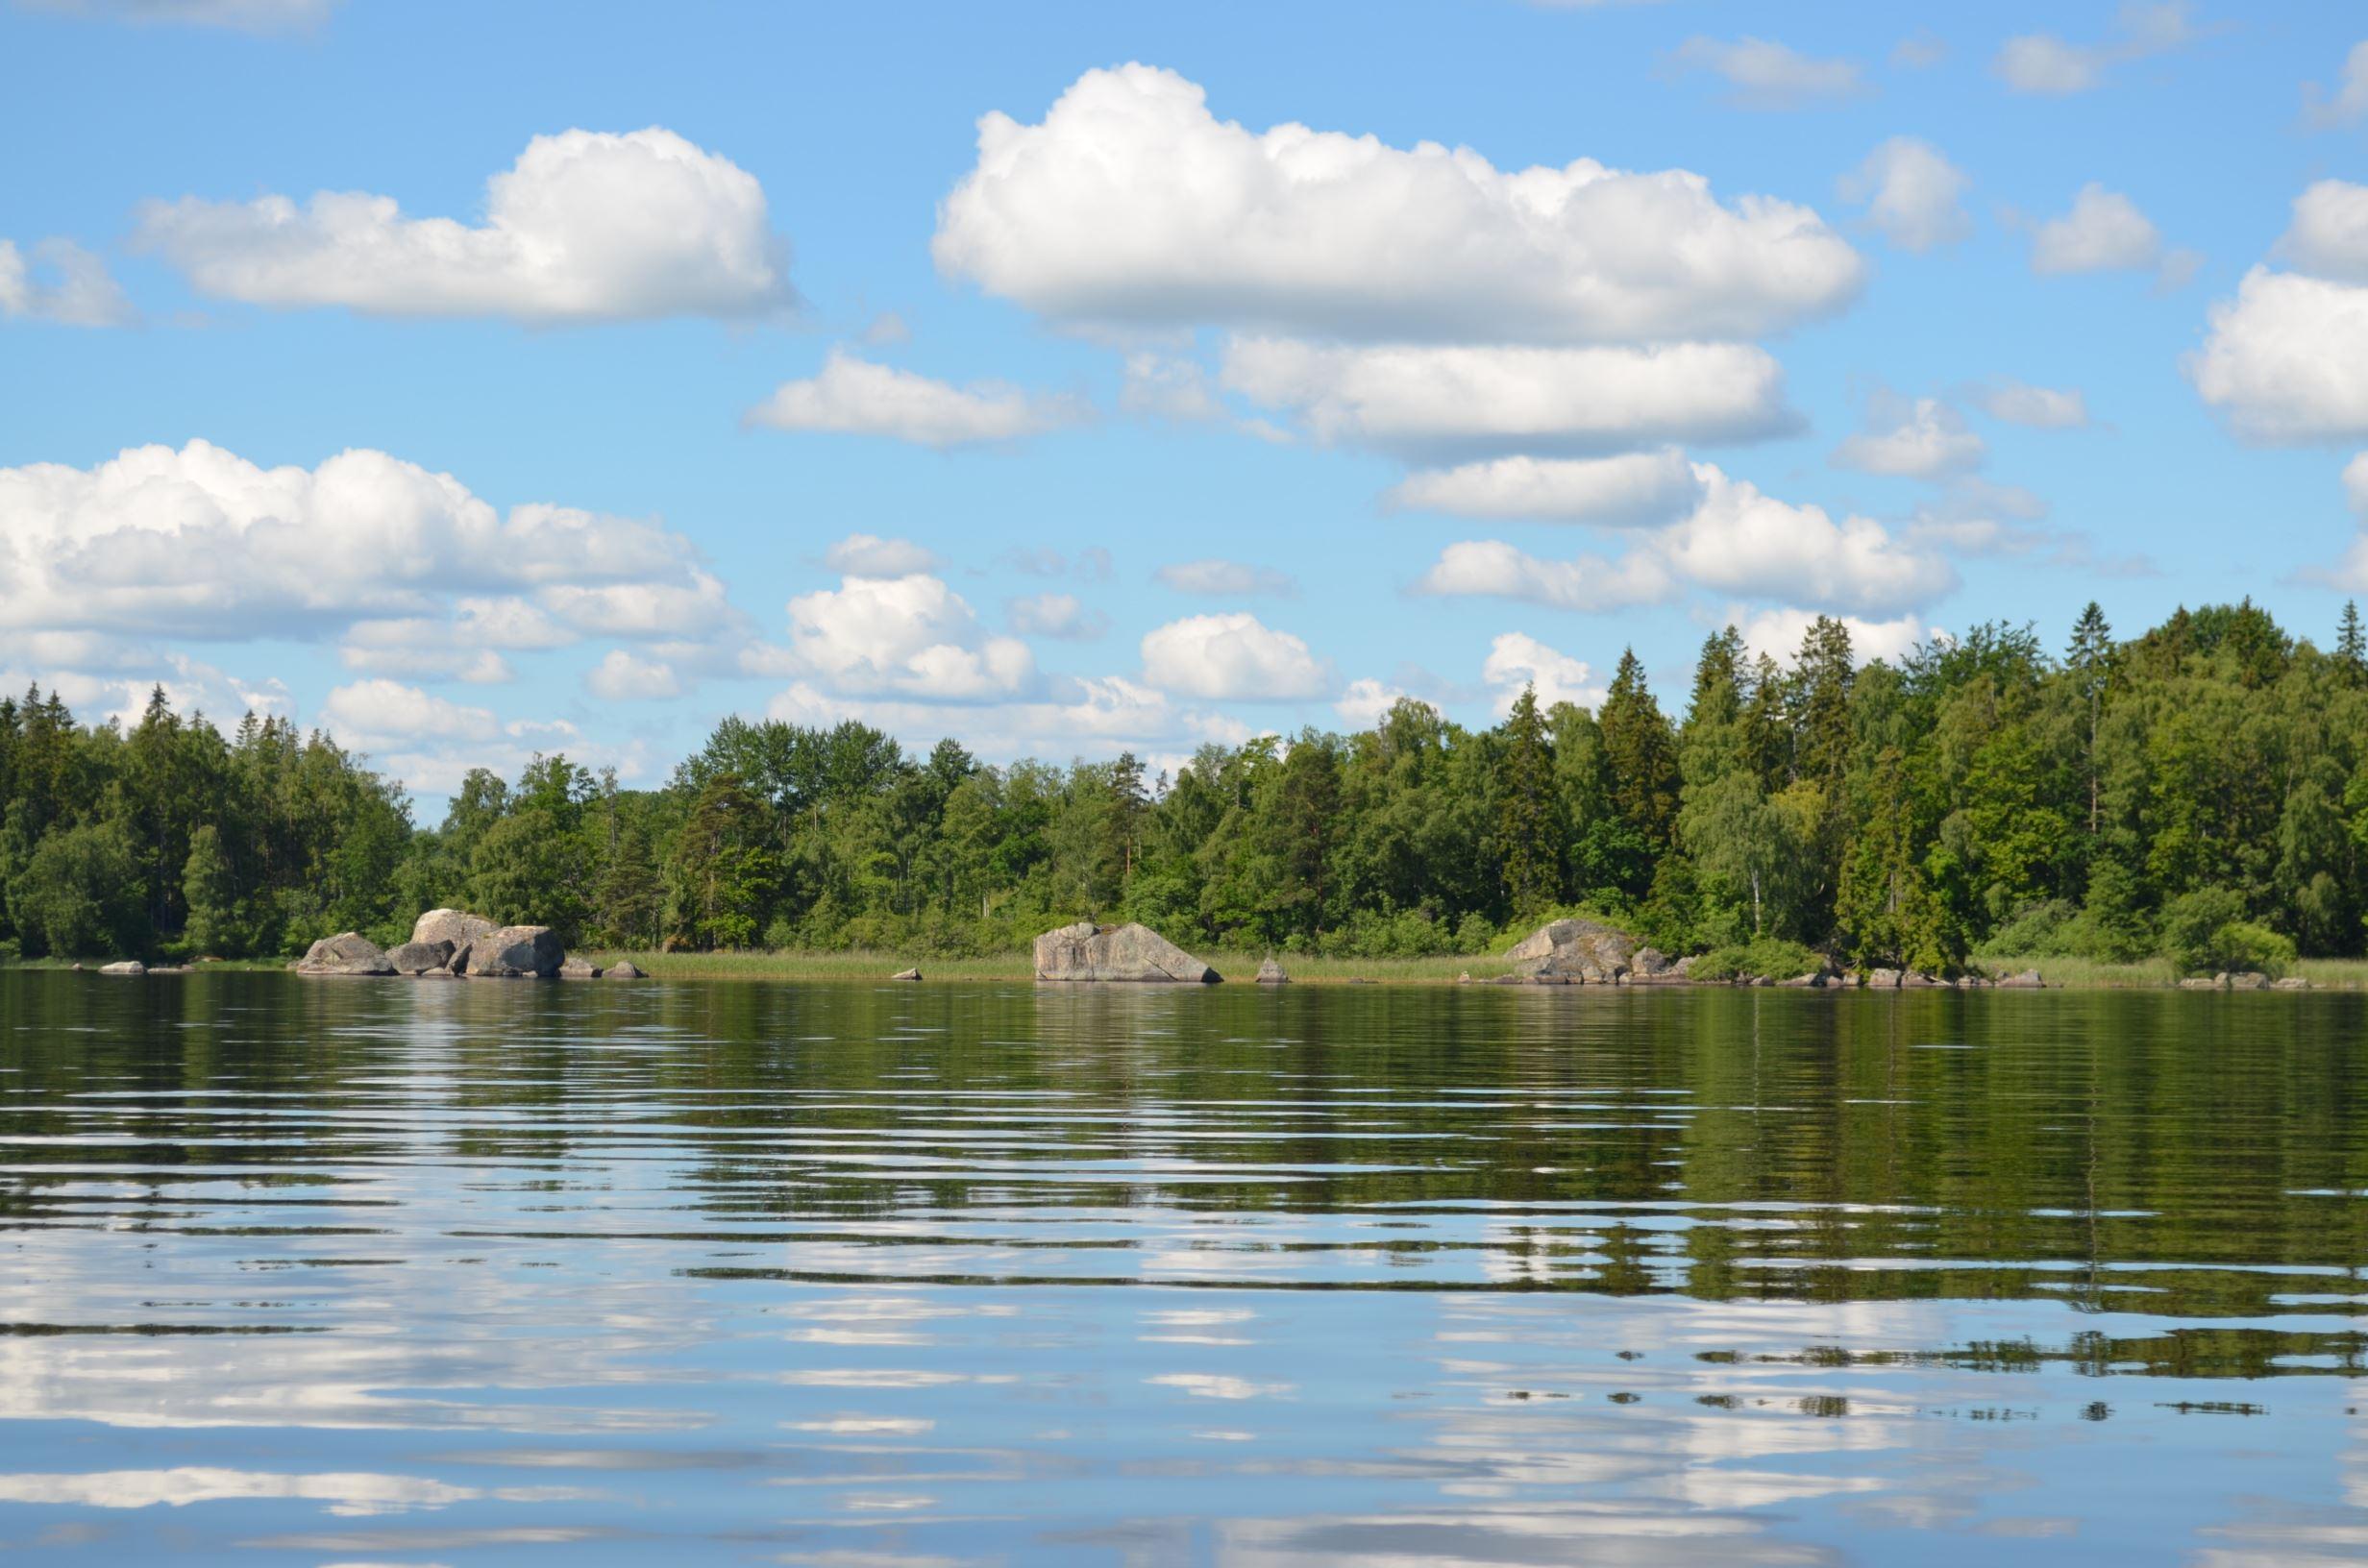 Ingela Eriksson, National park Åsnen